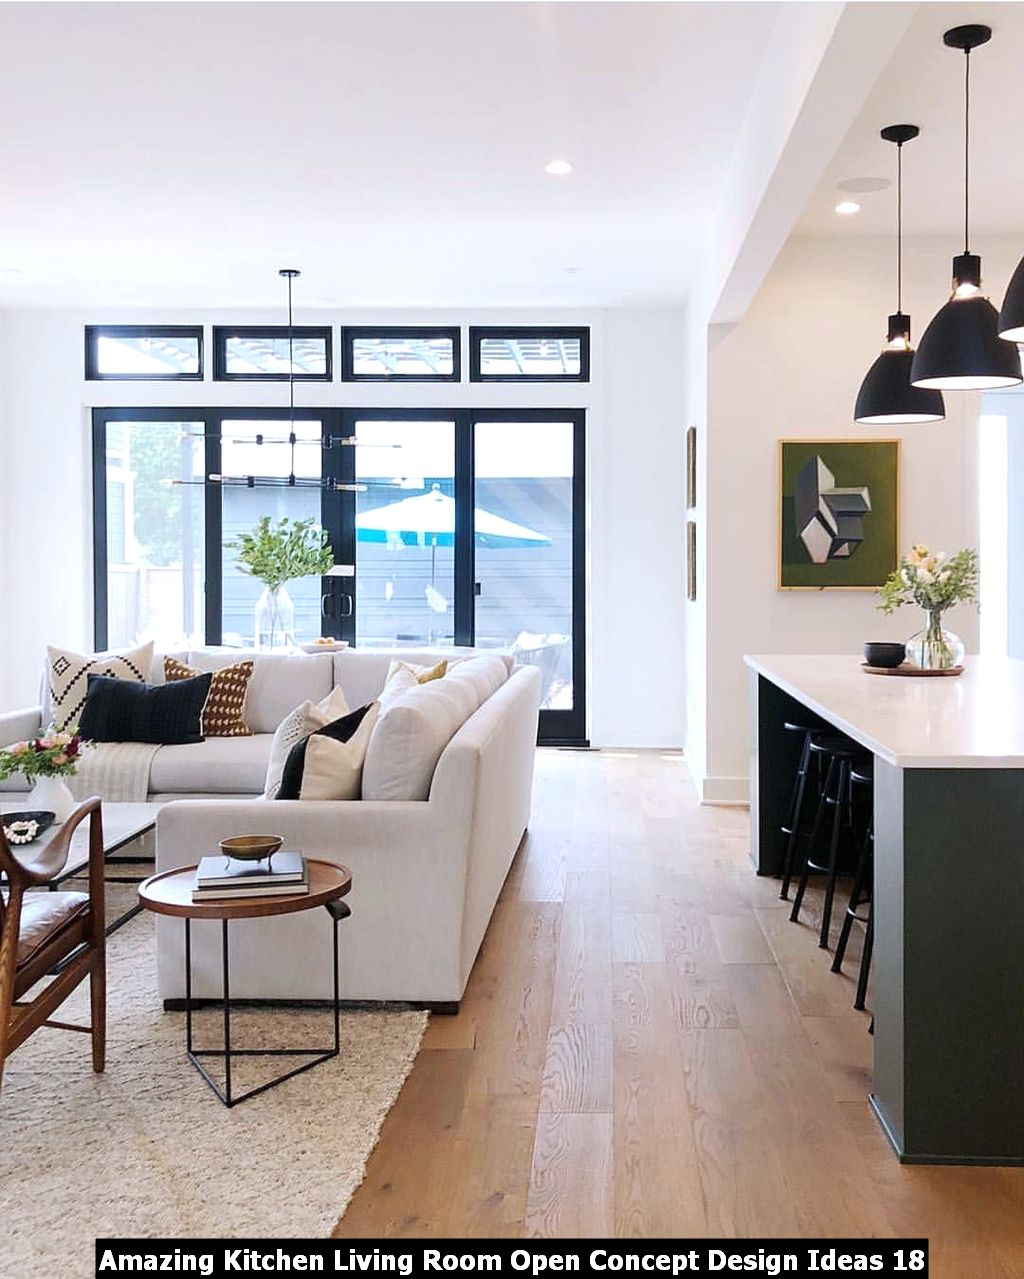 Amazing Kitchen Living Room Open Concept Design Ideas 18